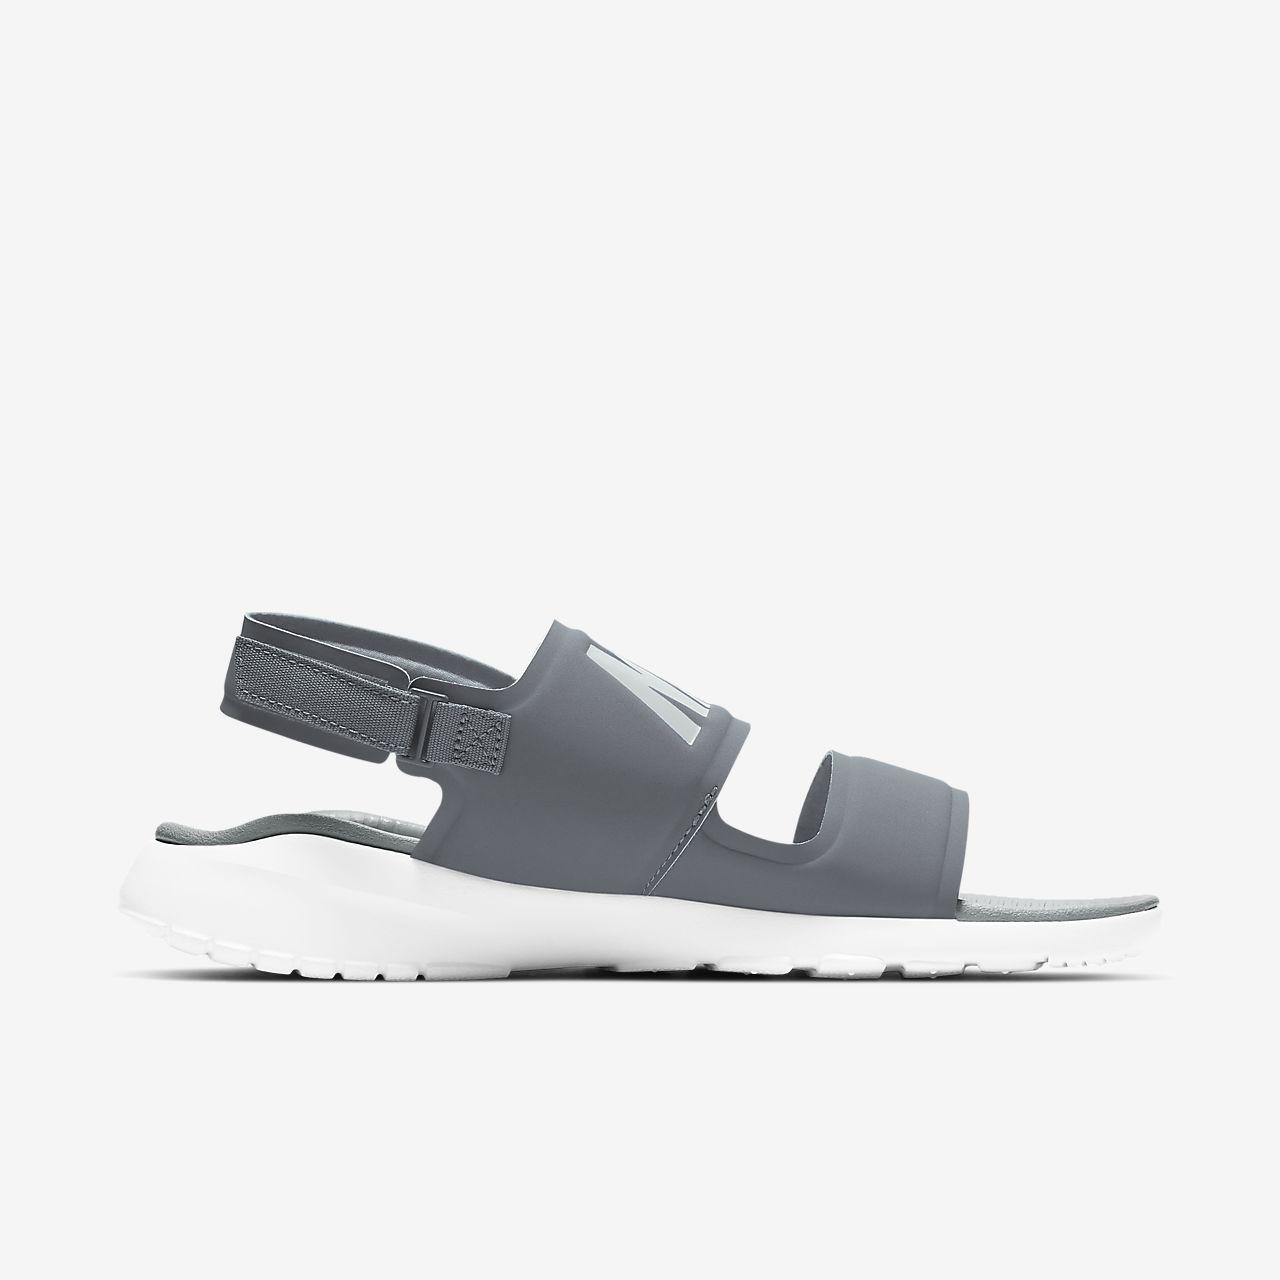 Nike Tanjun Womens Flip Flop